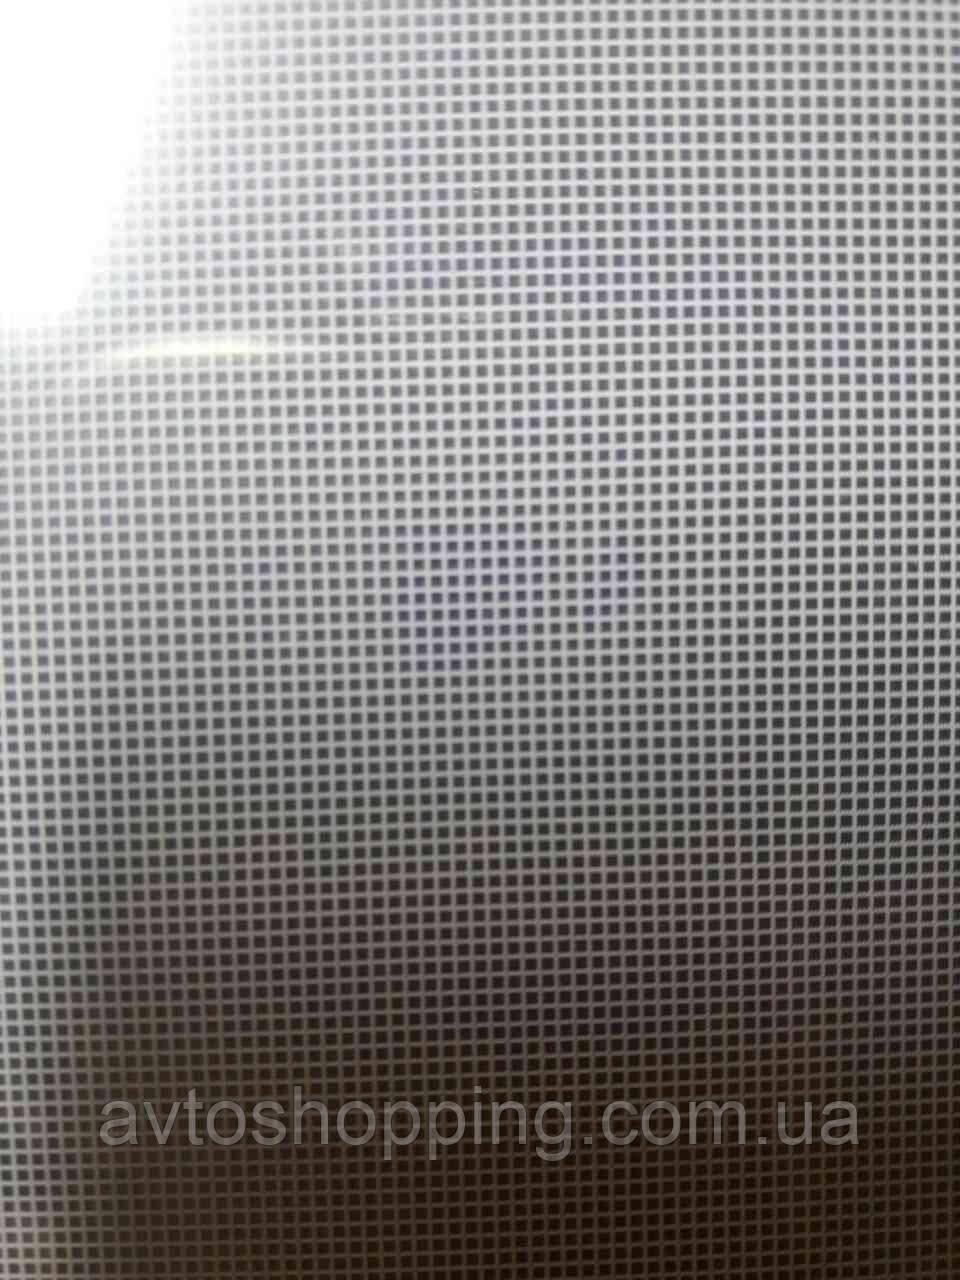 Пленка Тонировочная  в Сетку СЕТКА Guard 50 cм 3 метра, БЕЛАЯ пленка для тонировки стекол. Антицарапка